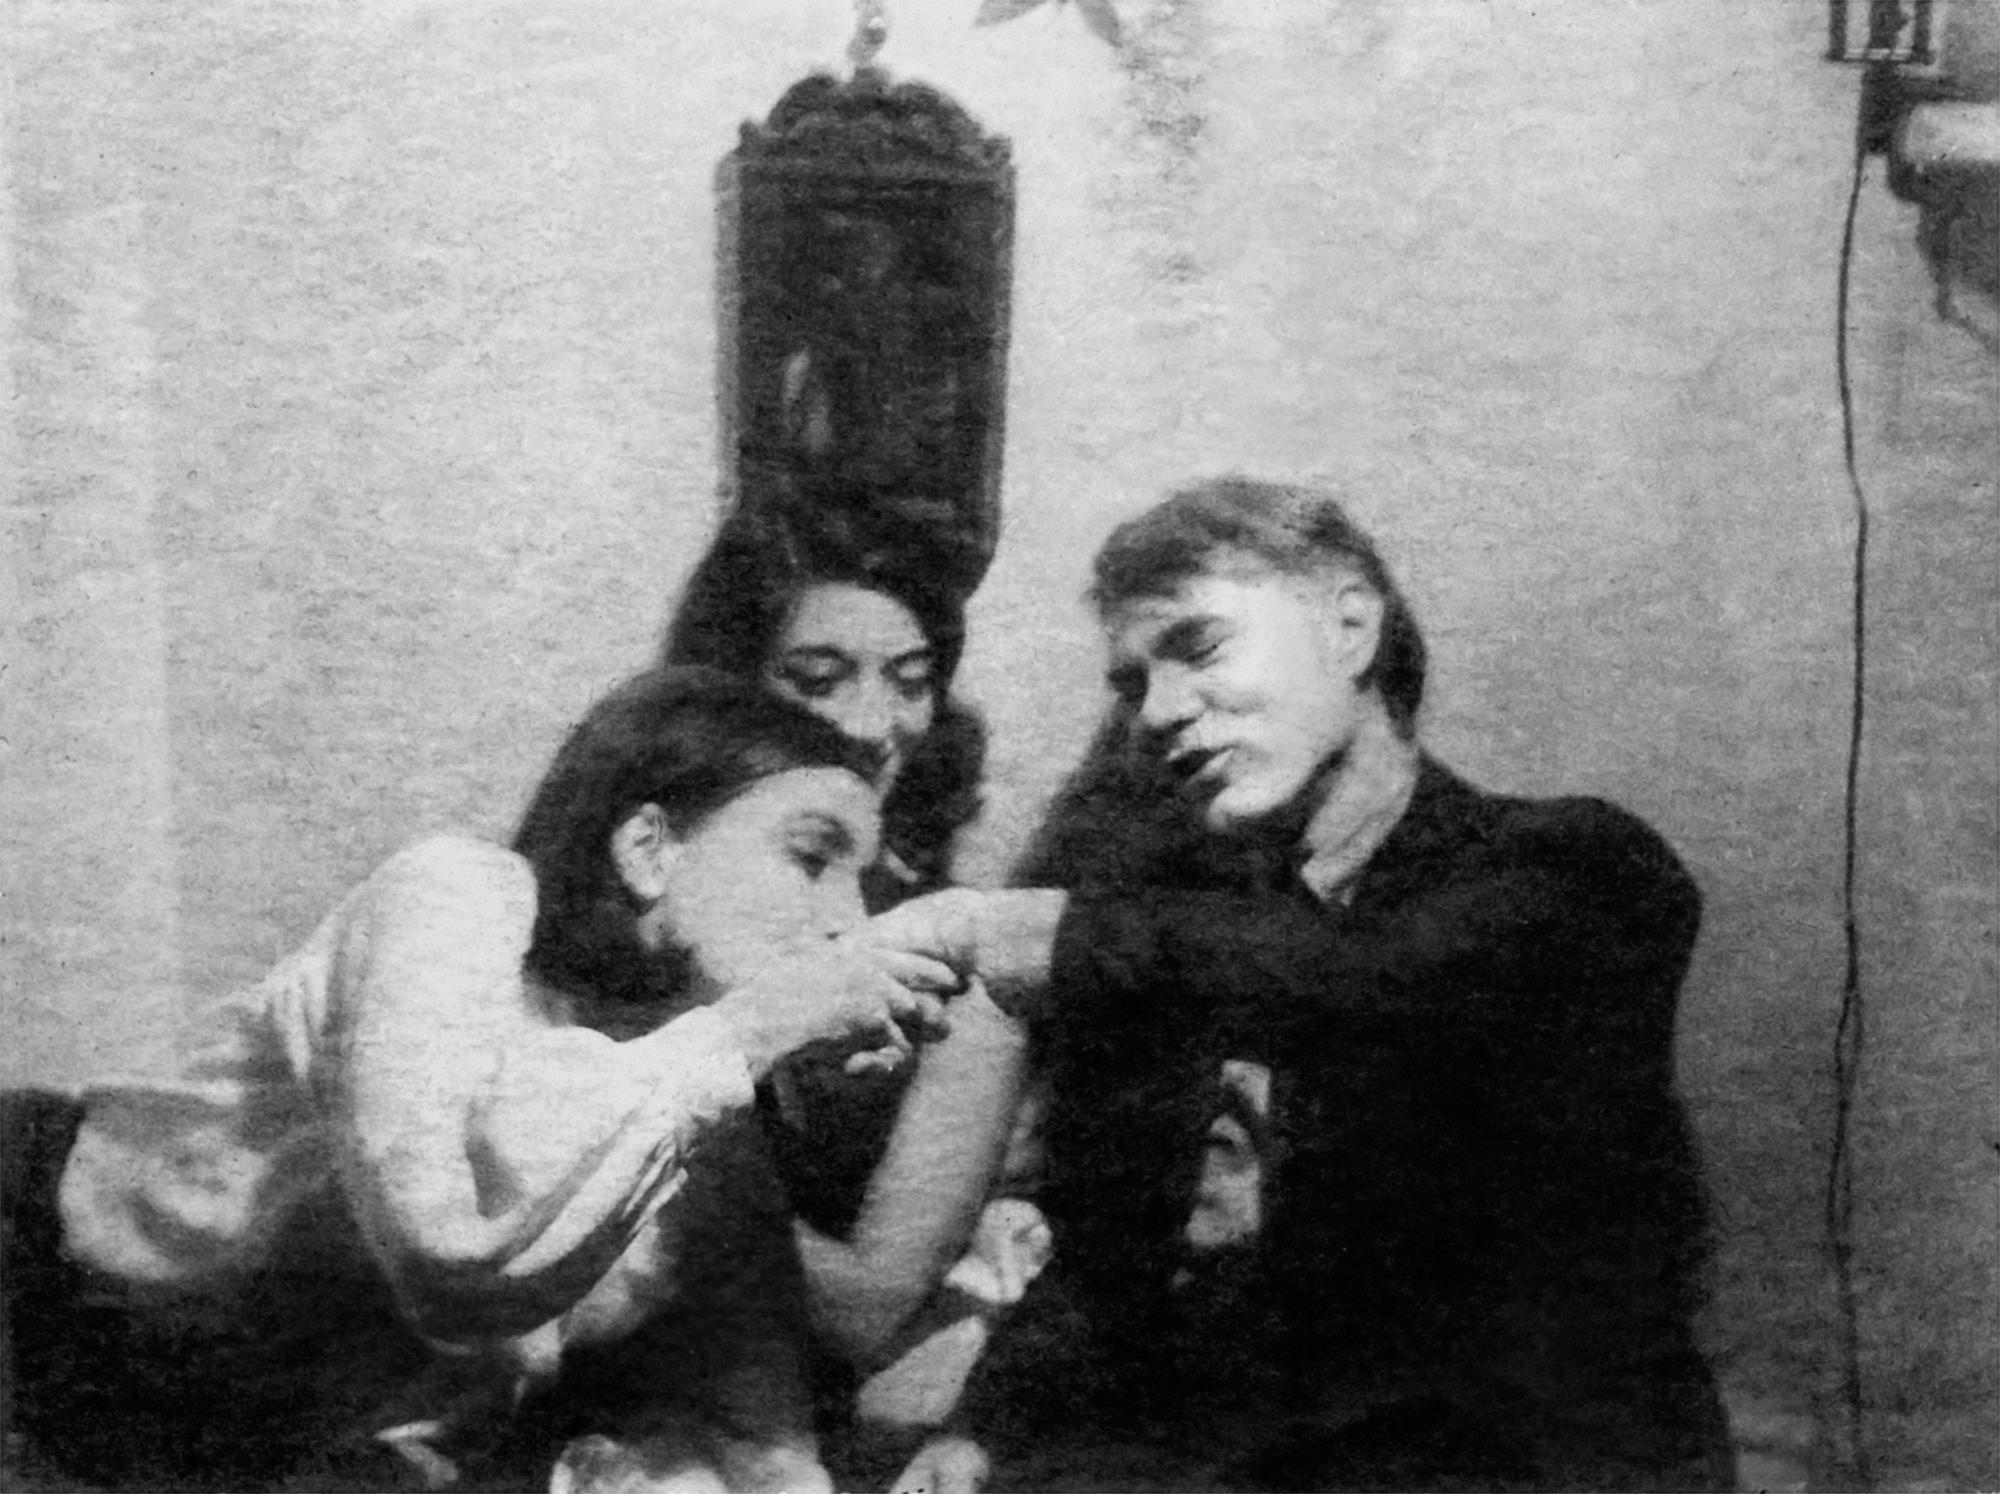 Bea kissing Andy Warhol's hand.